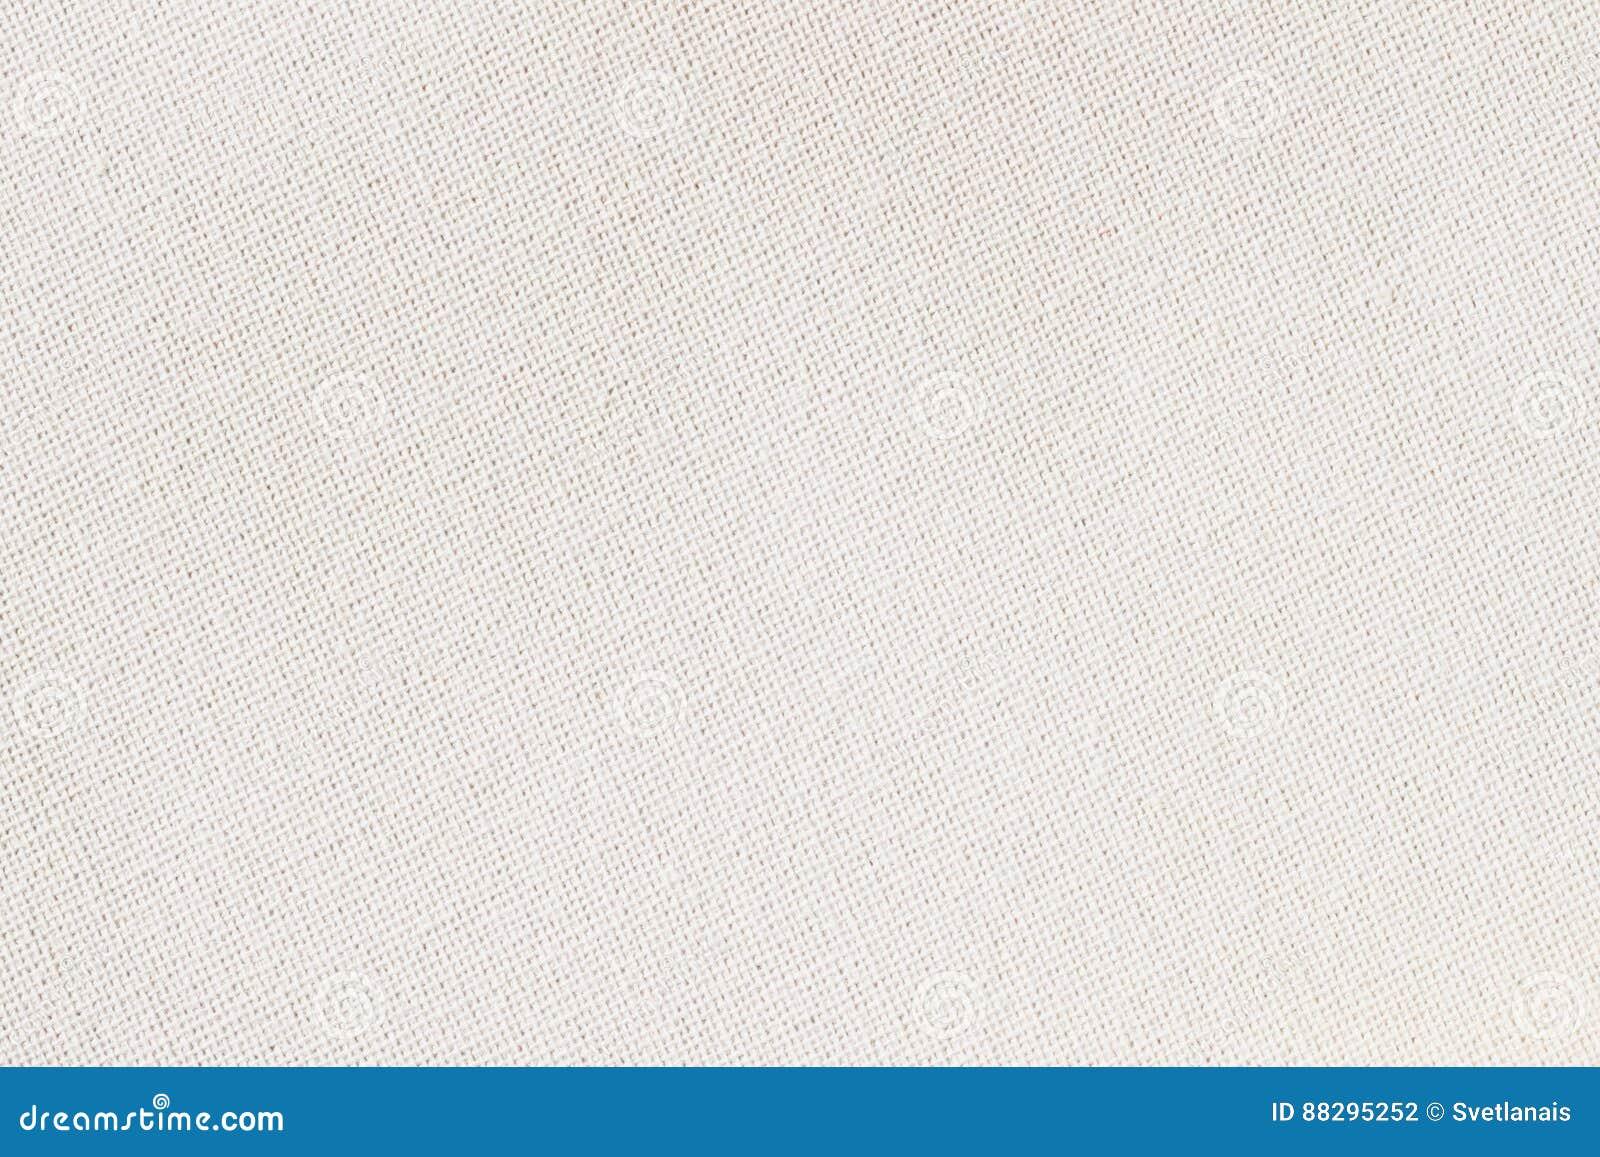 Sackcloth, καμβάς, ύφασμα, γιούτα, σχέδιο σύστασης για το υπόβαθρο Μαλακό χρώμα κρέμας Μικρή διαγώνιος